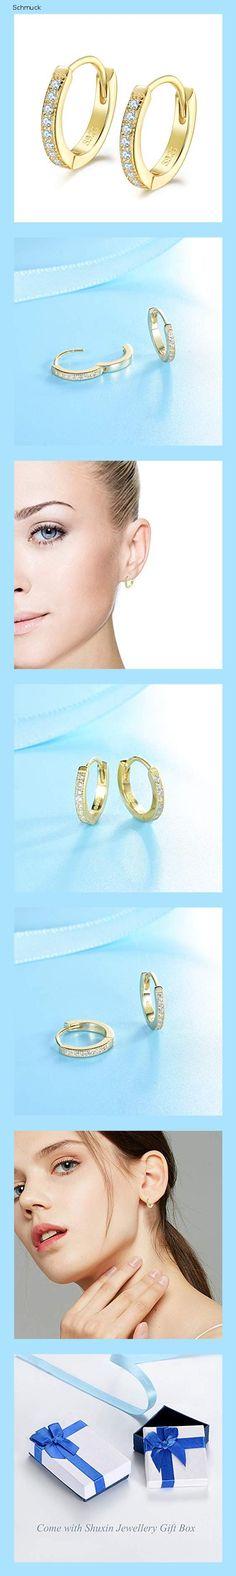 Dicheng Creolen Gold Damen Ohrringe, 925 Sterling Silber Creolen mit AAA Zirkonia, Durchmesser 13mm Klein Schlafen Kreolen, Kommt in Schmuck Geschenk Box - 14fi